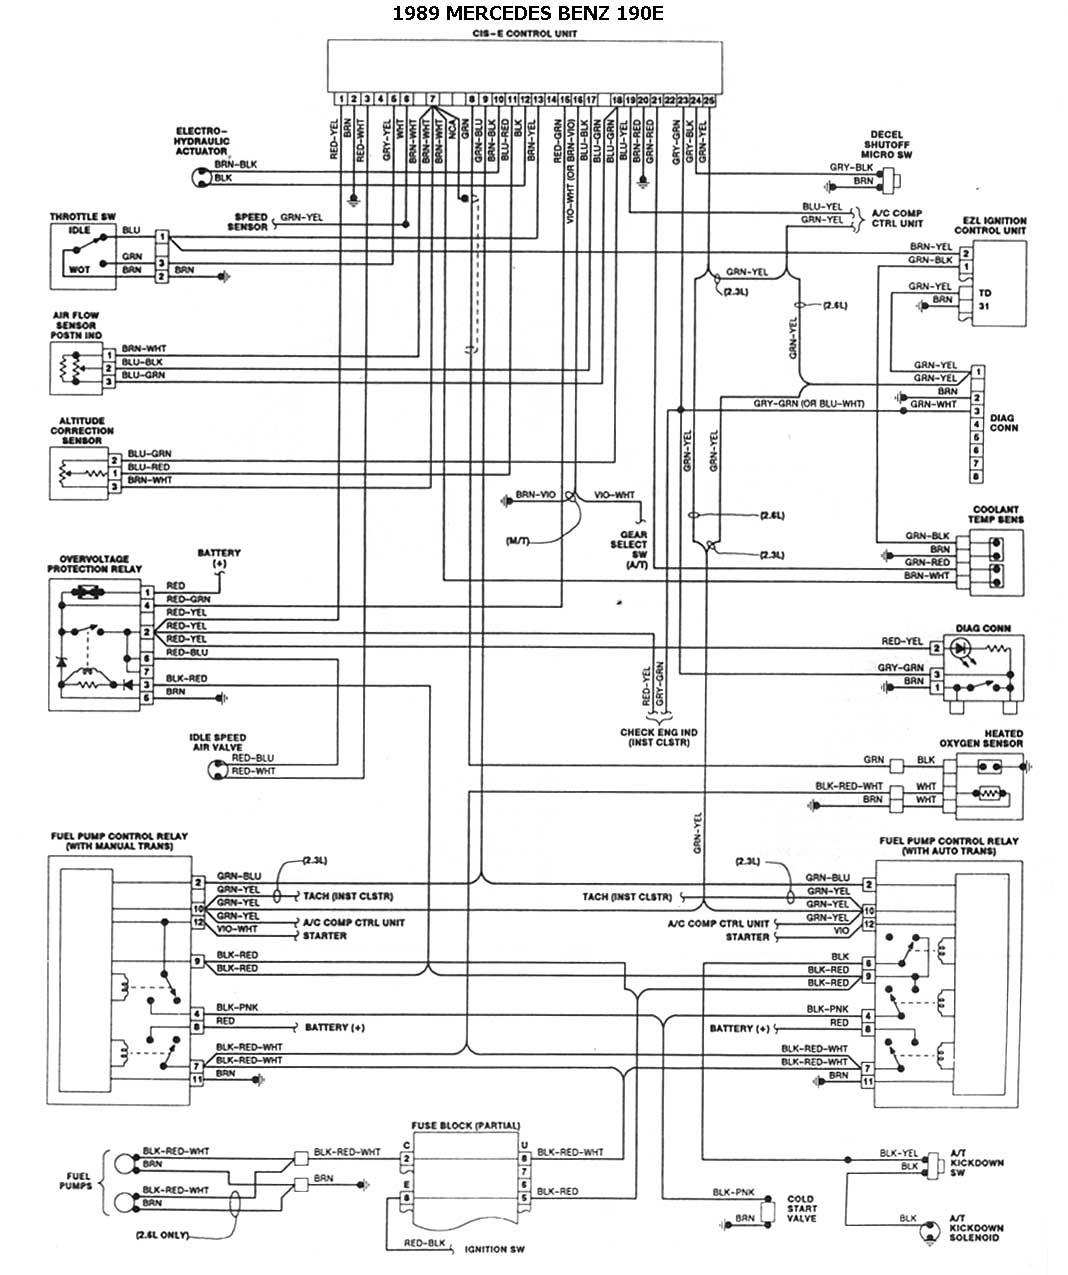 2003 Mercedes C230 Stereo Wiring Diagram. Mercedes. Auto